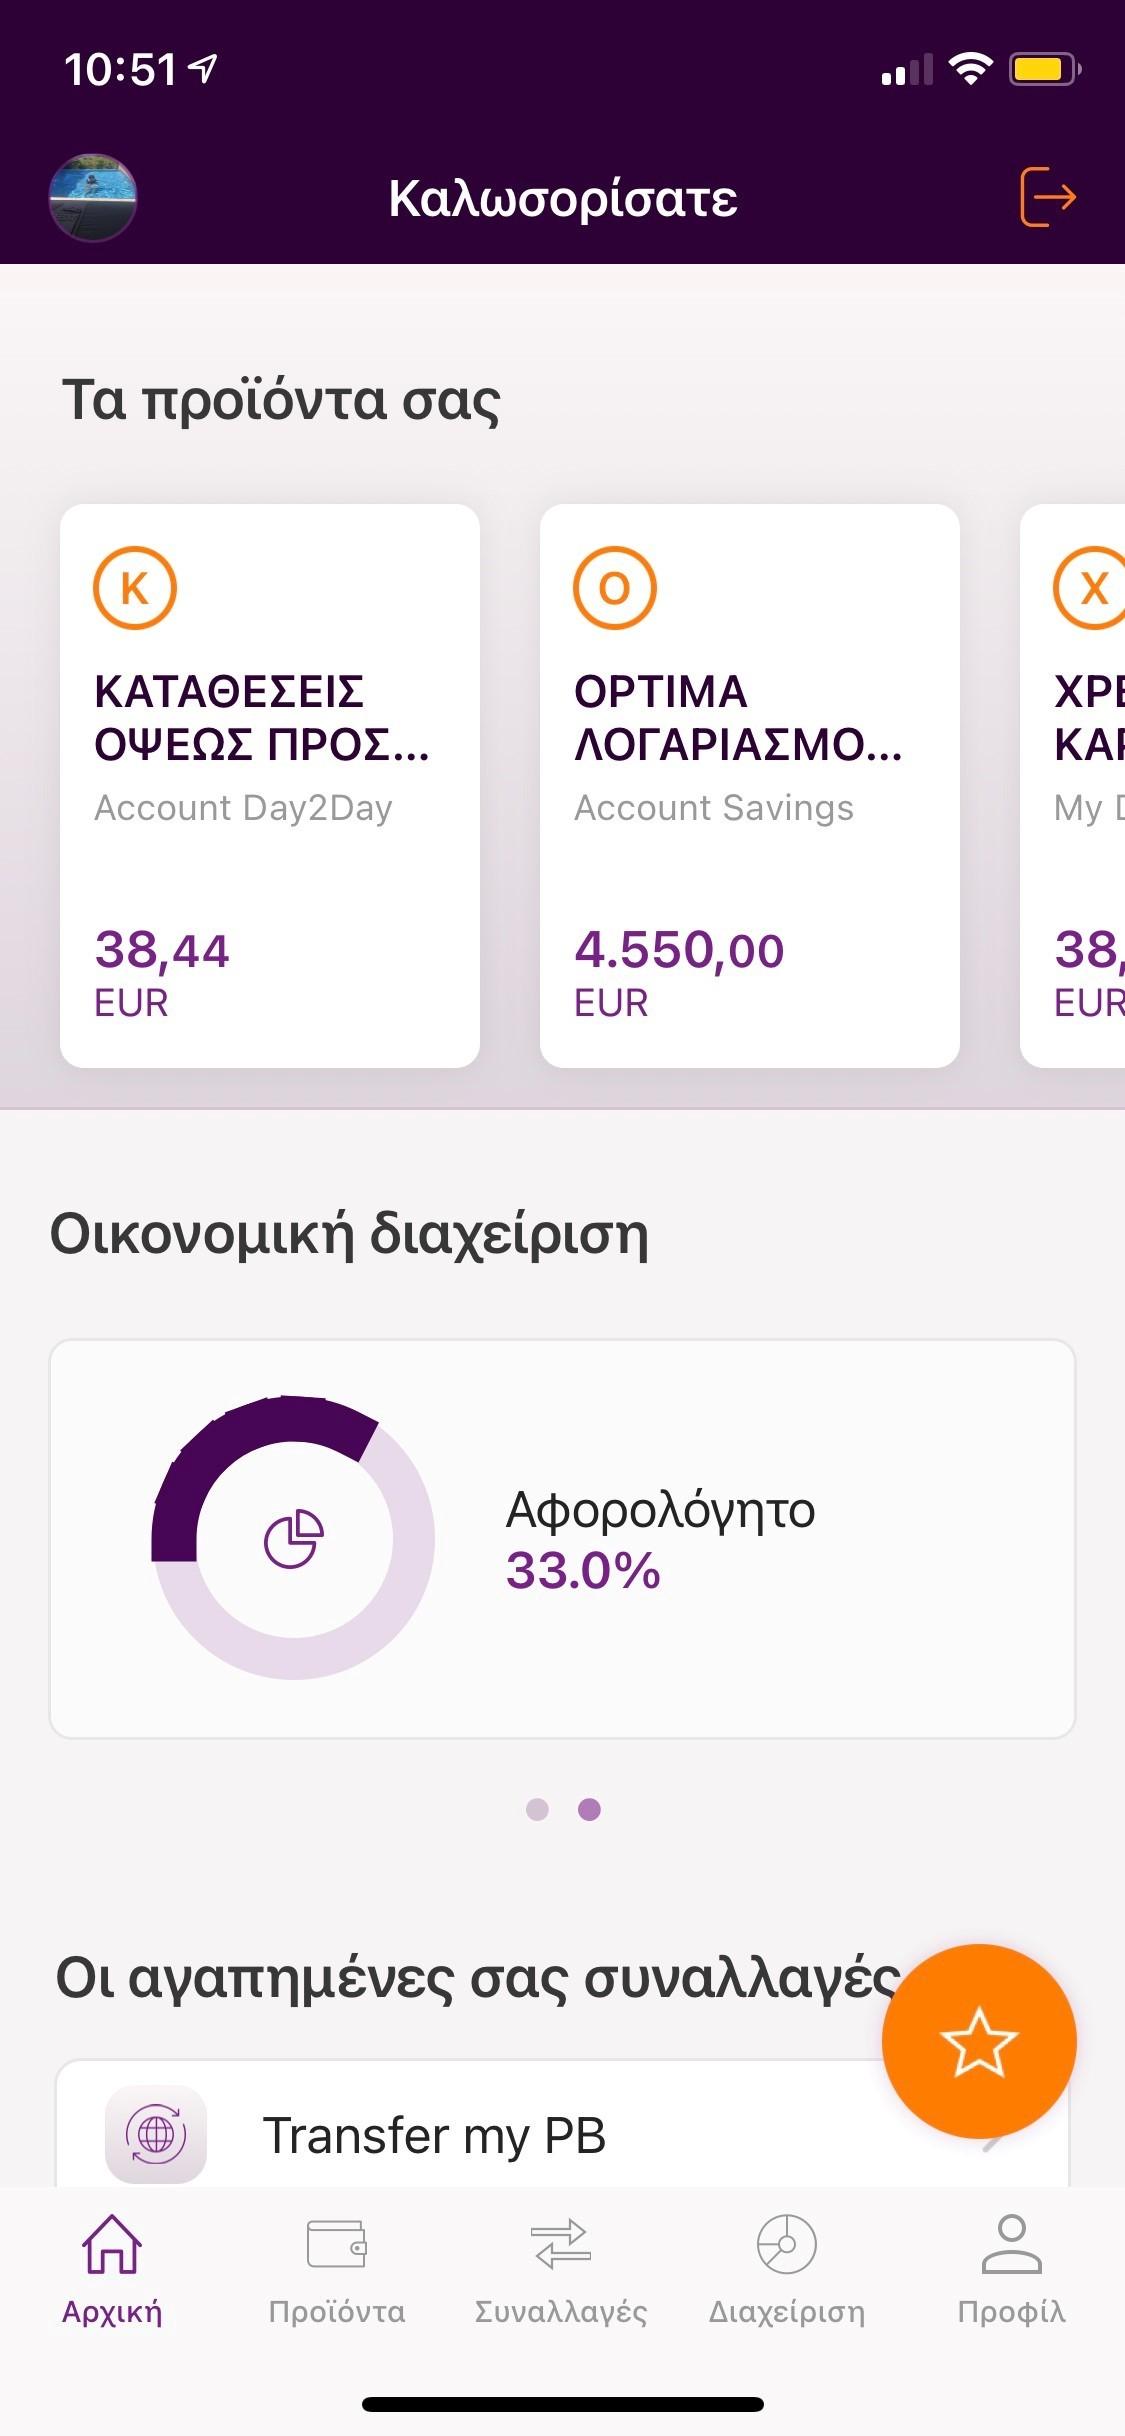 Optima bank: Ήρθε το νέο mobile banking